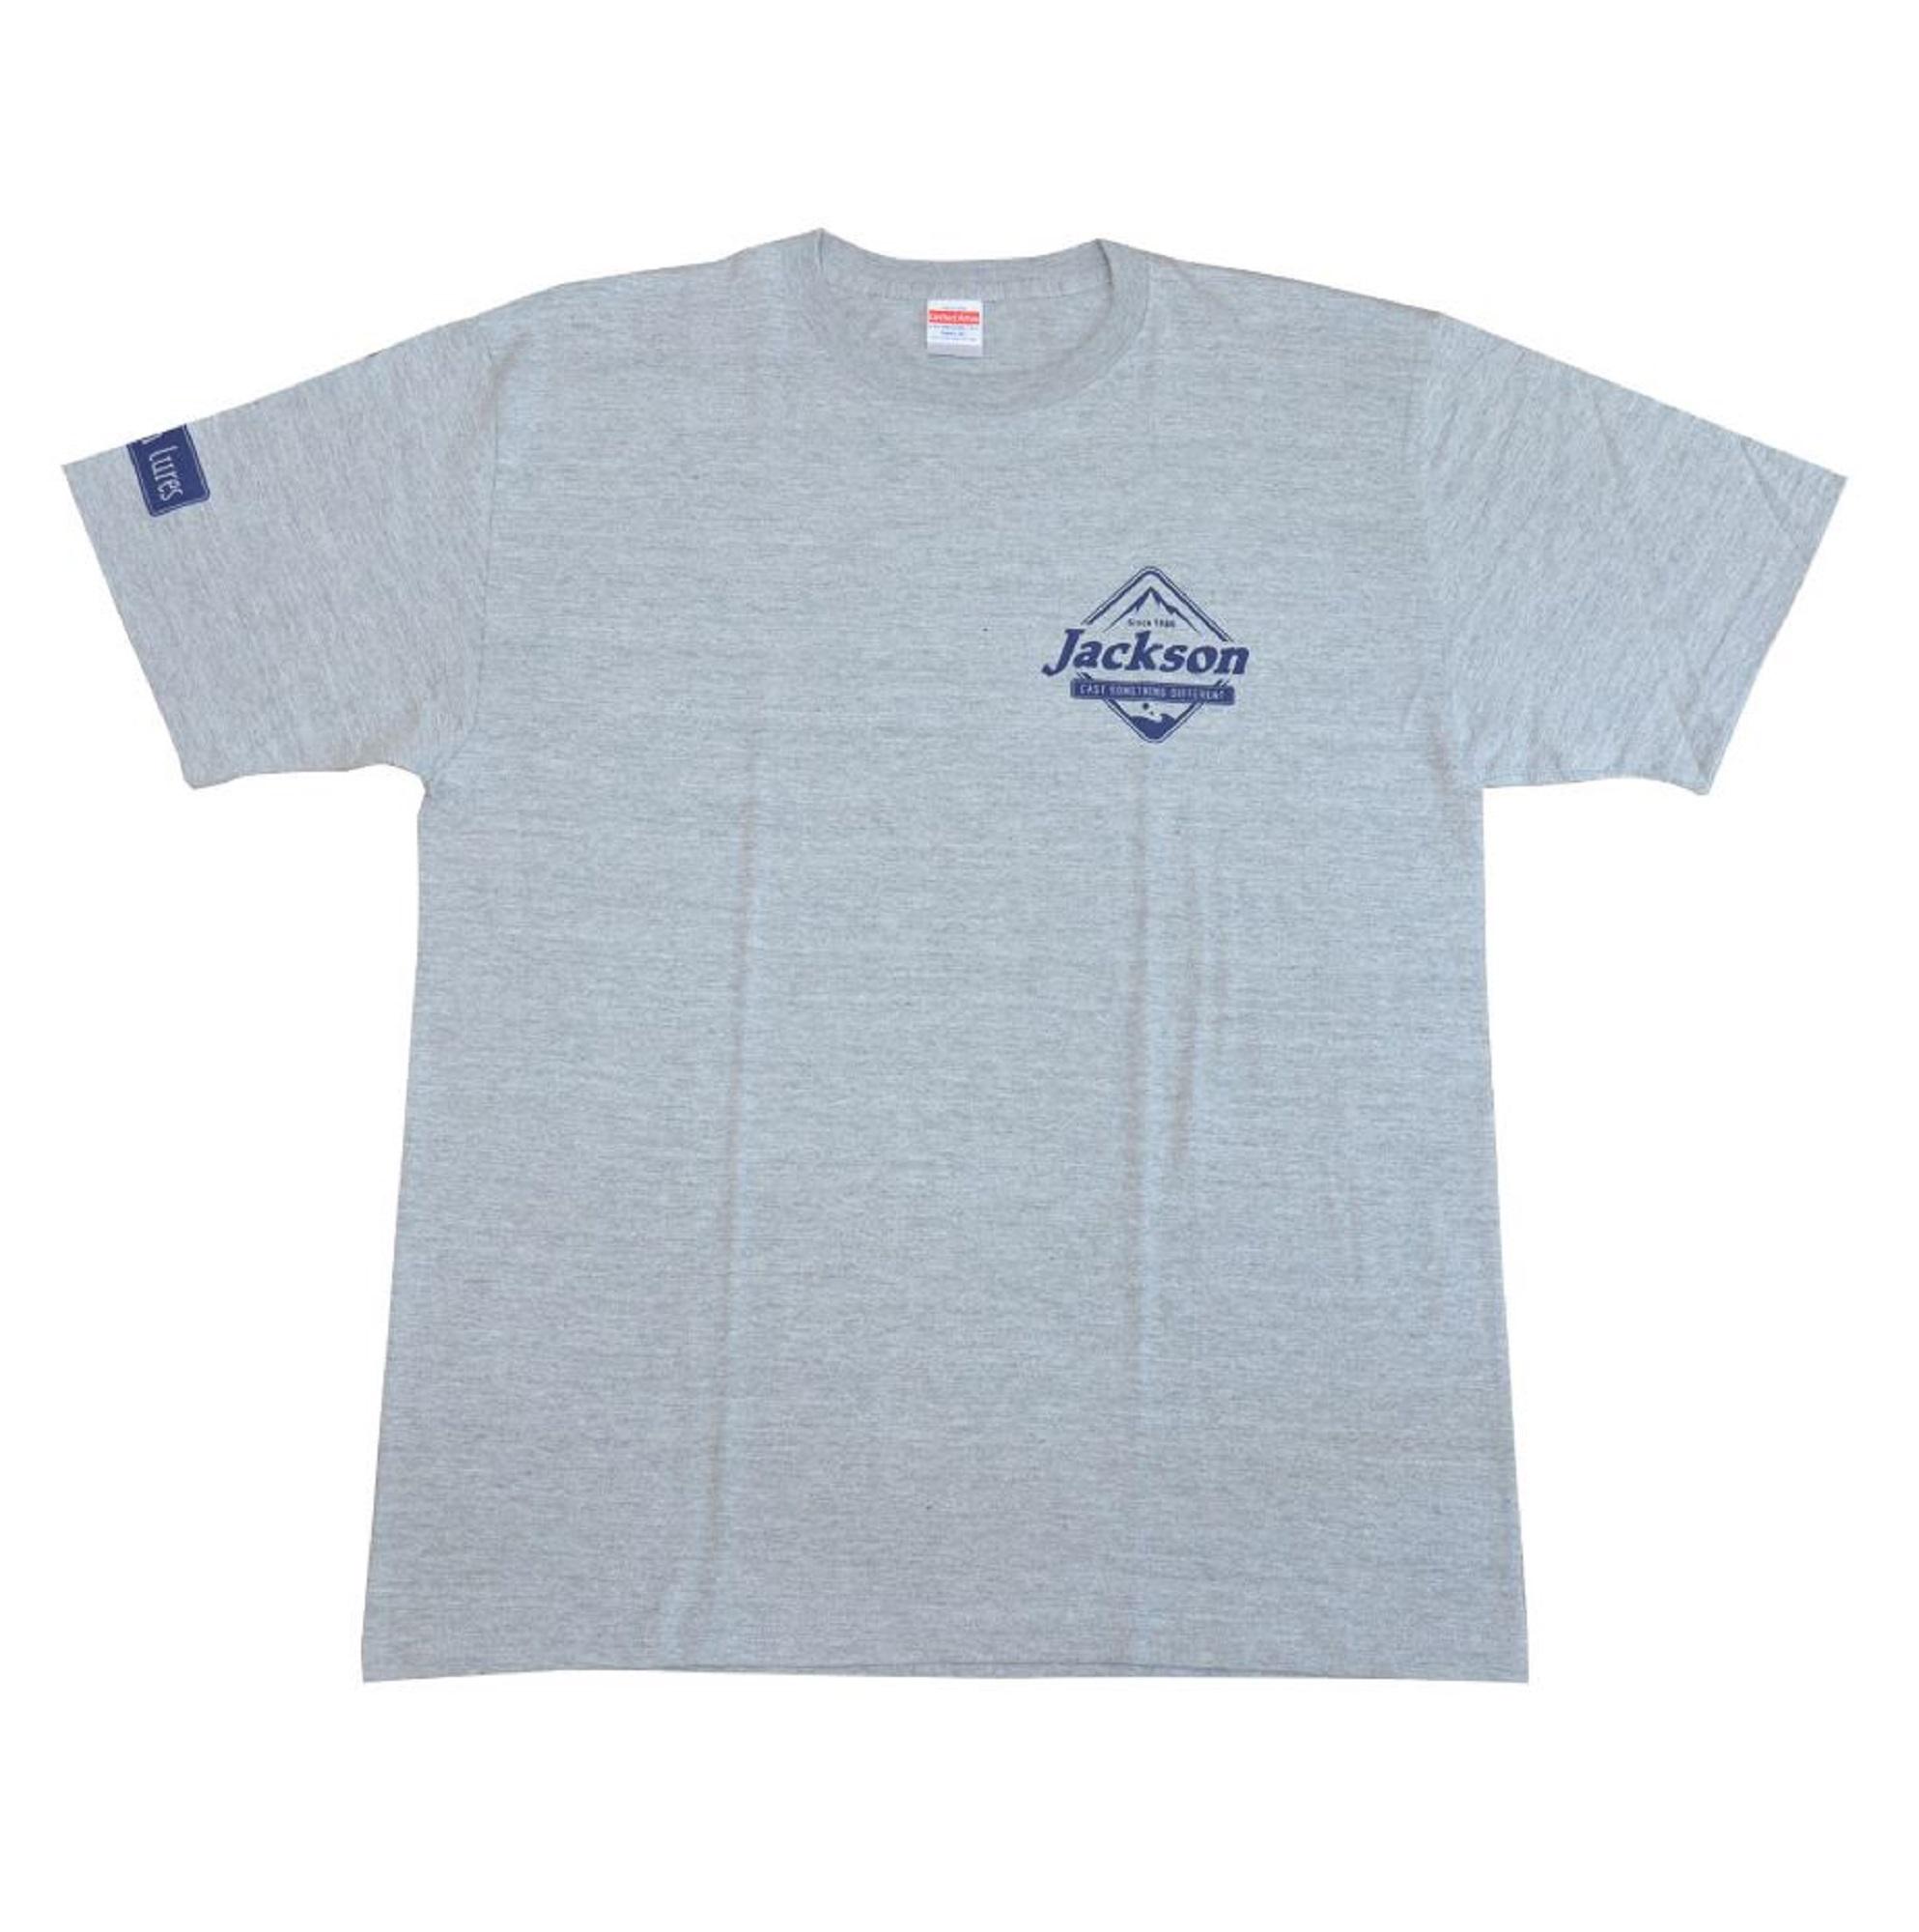 Jackson T-shirt Logo Tee Gray XL (8987)